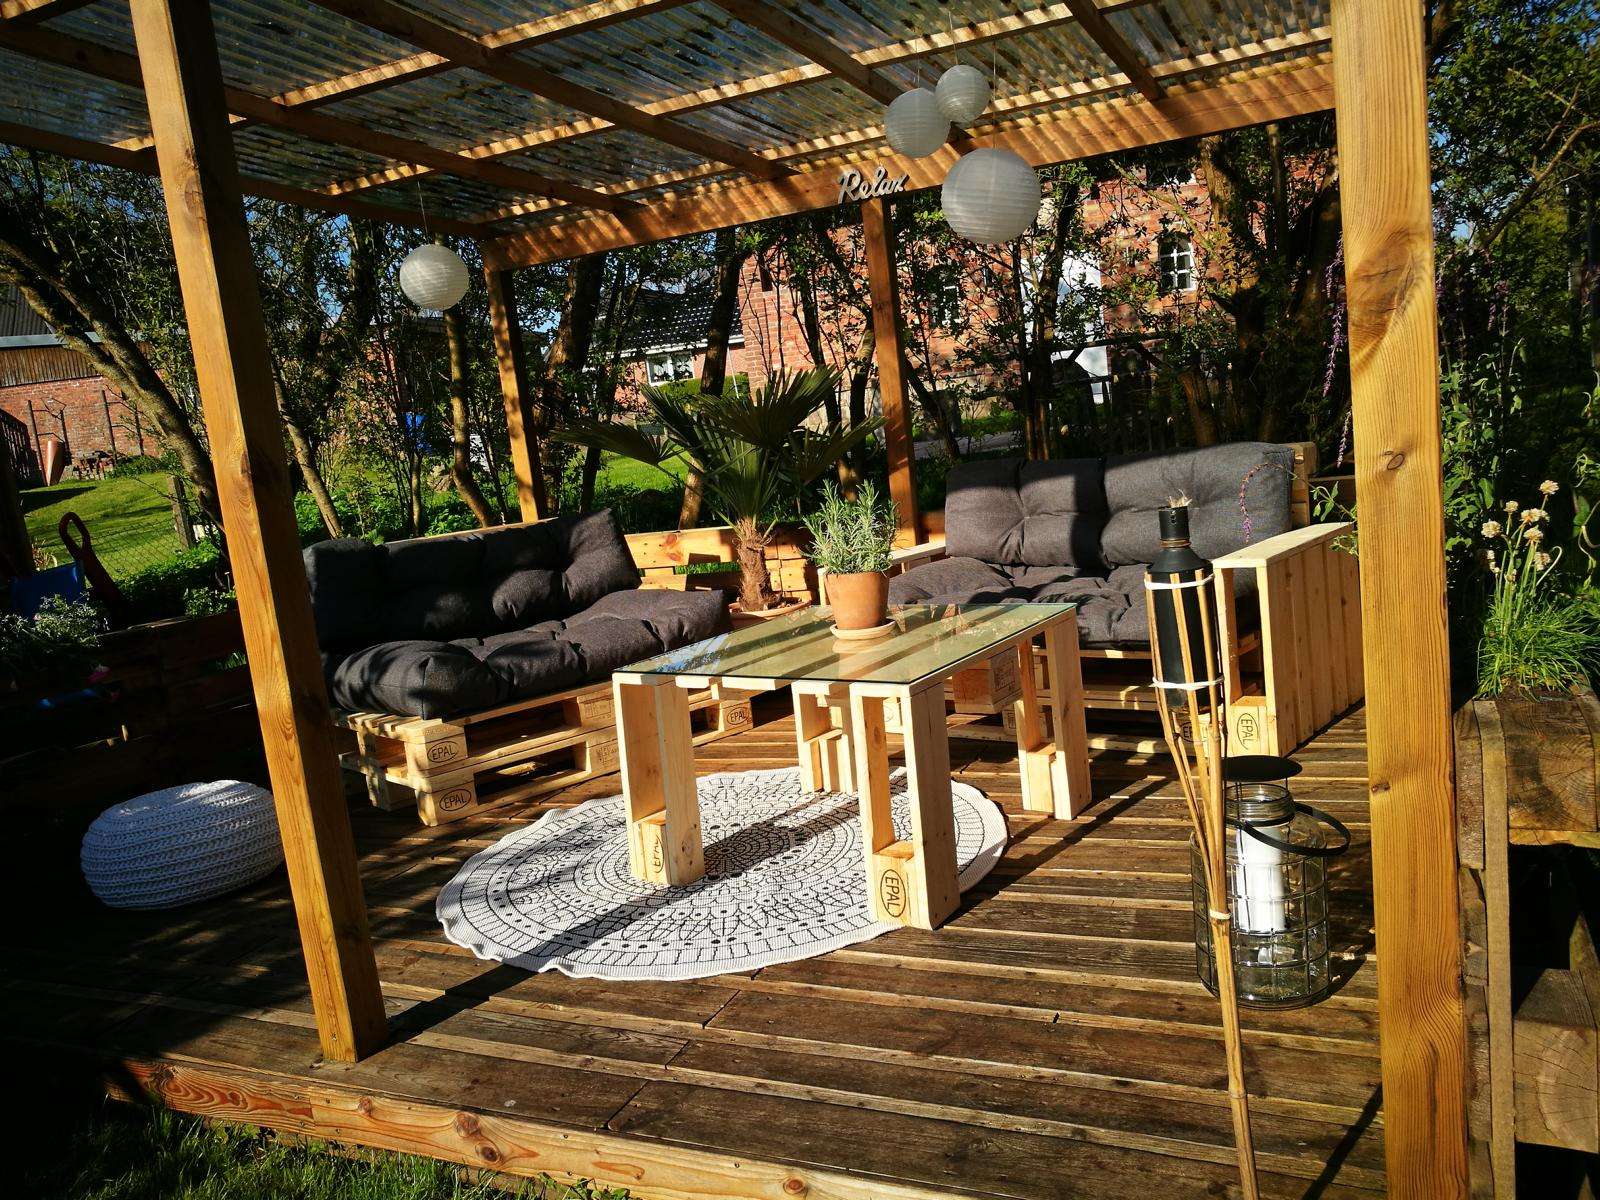 ᐅ balkonmöbel & terrassenmöbel aus paletten | anleitungen & shop